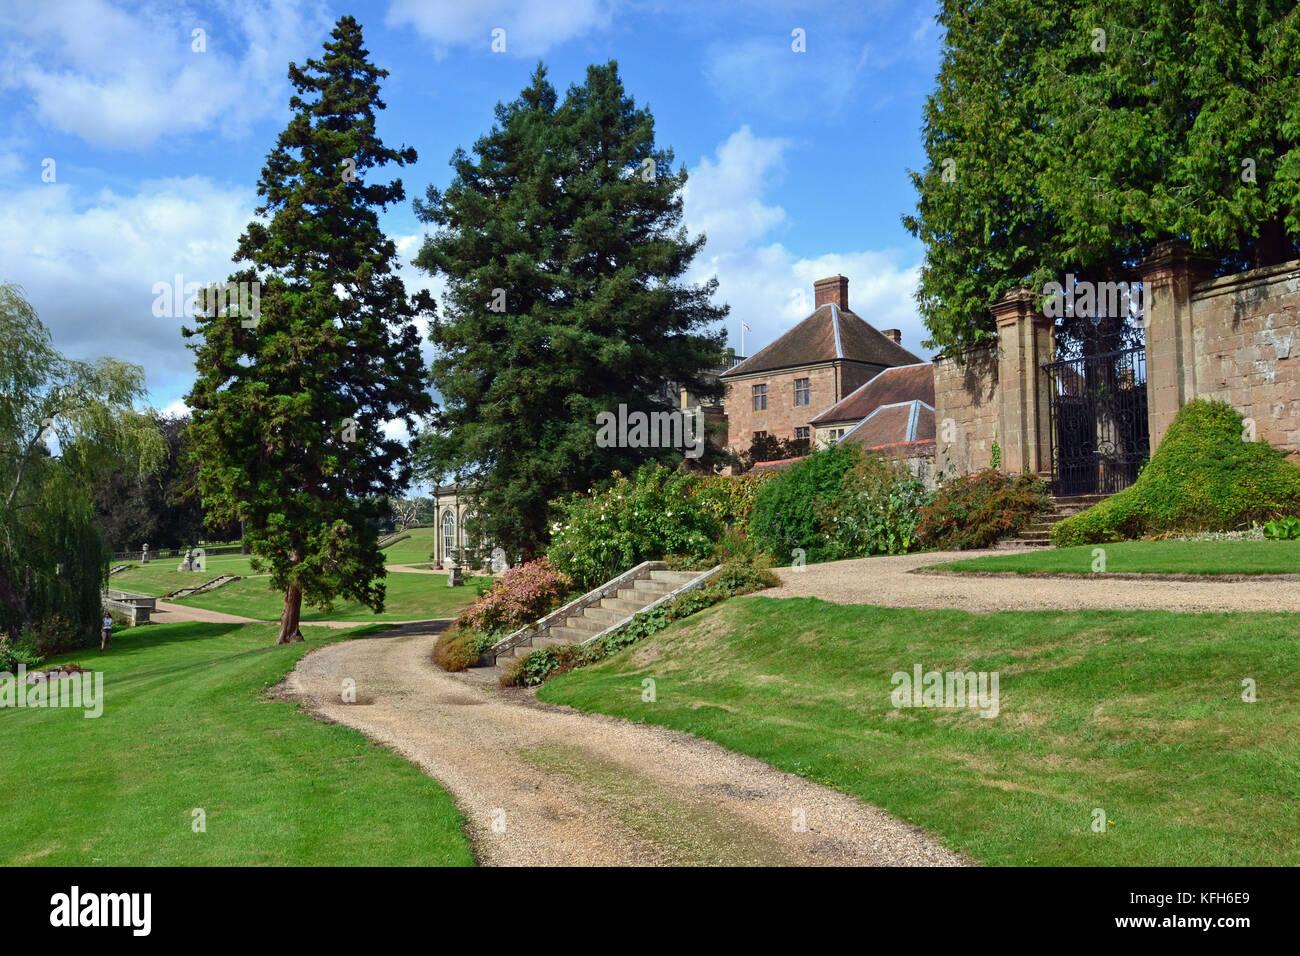 View of formal garden at Stoneleigh Abbey, Stoneleigh, Warwickshire, UK - Stock Image